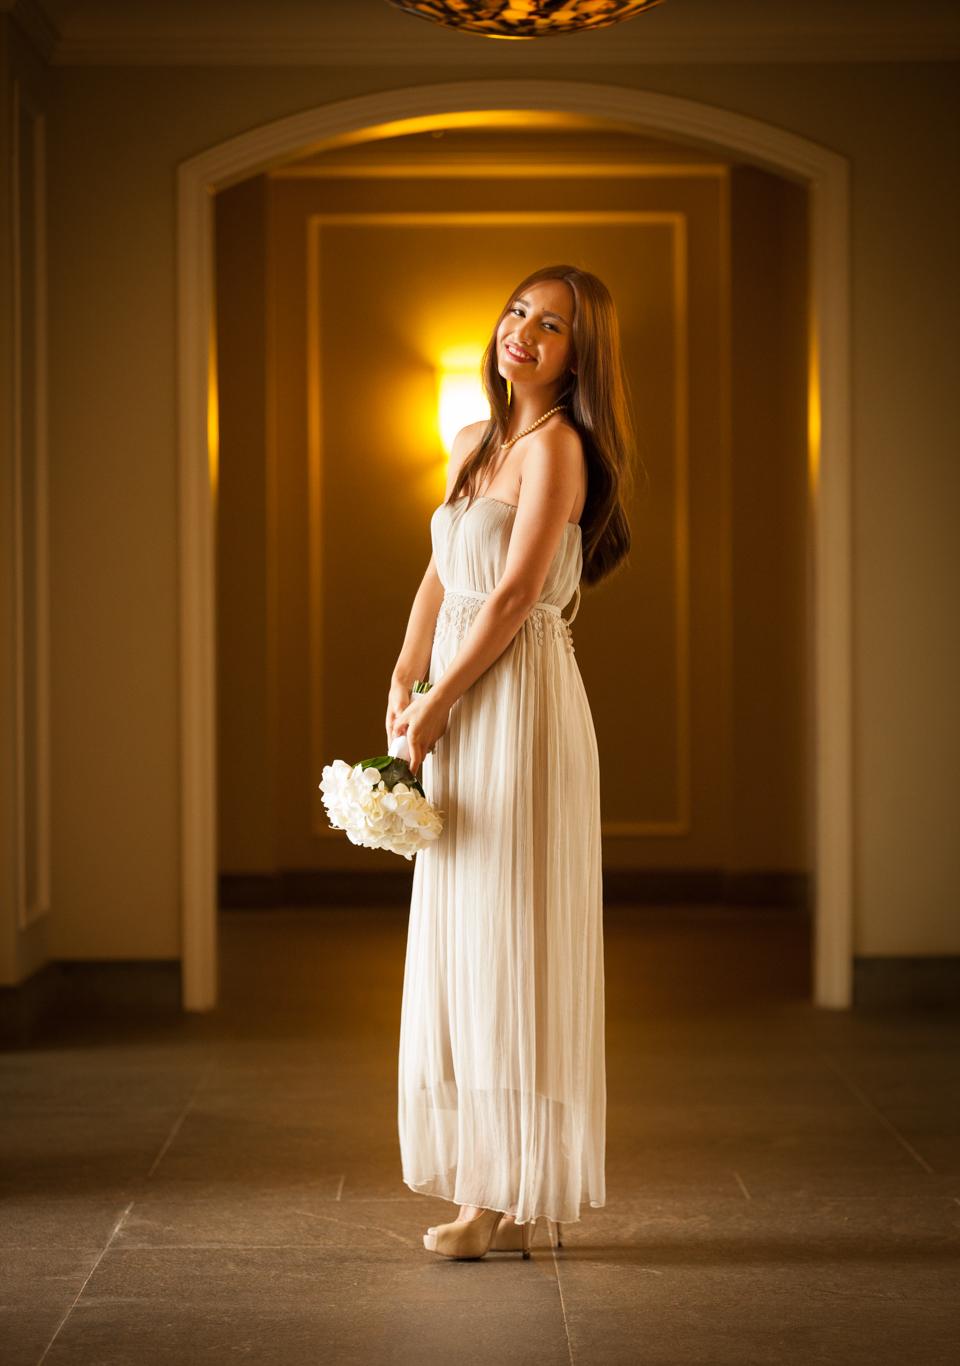 026_maui-wedding-photographer-kaua-photography